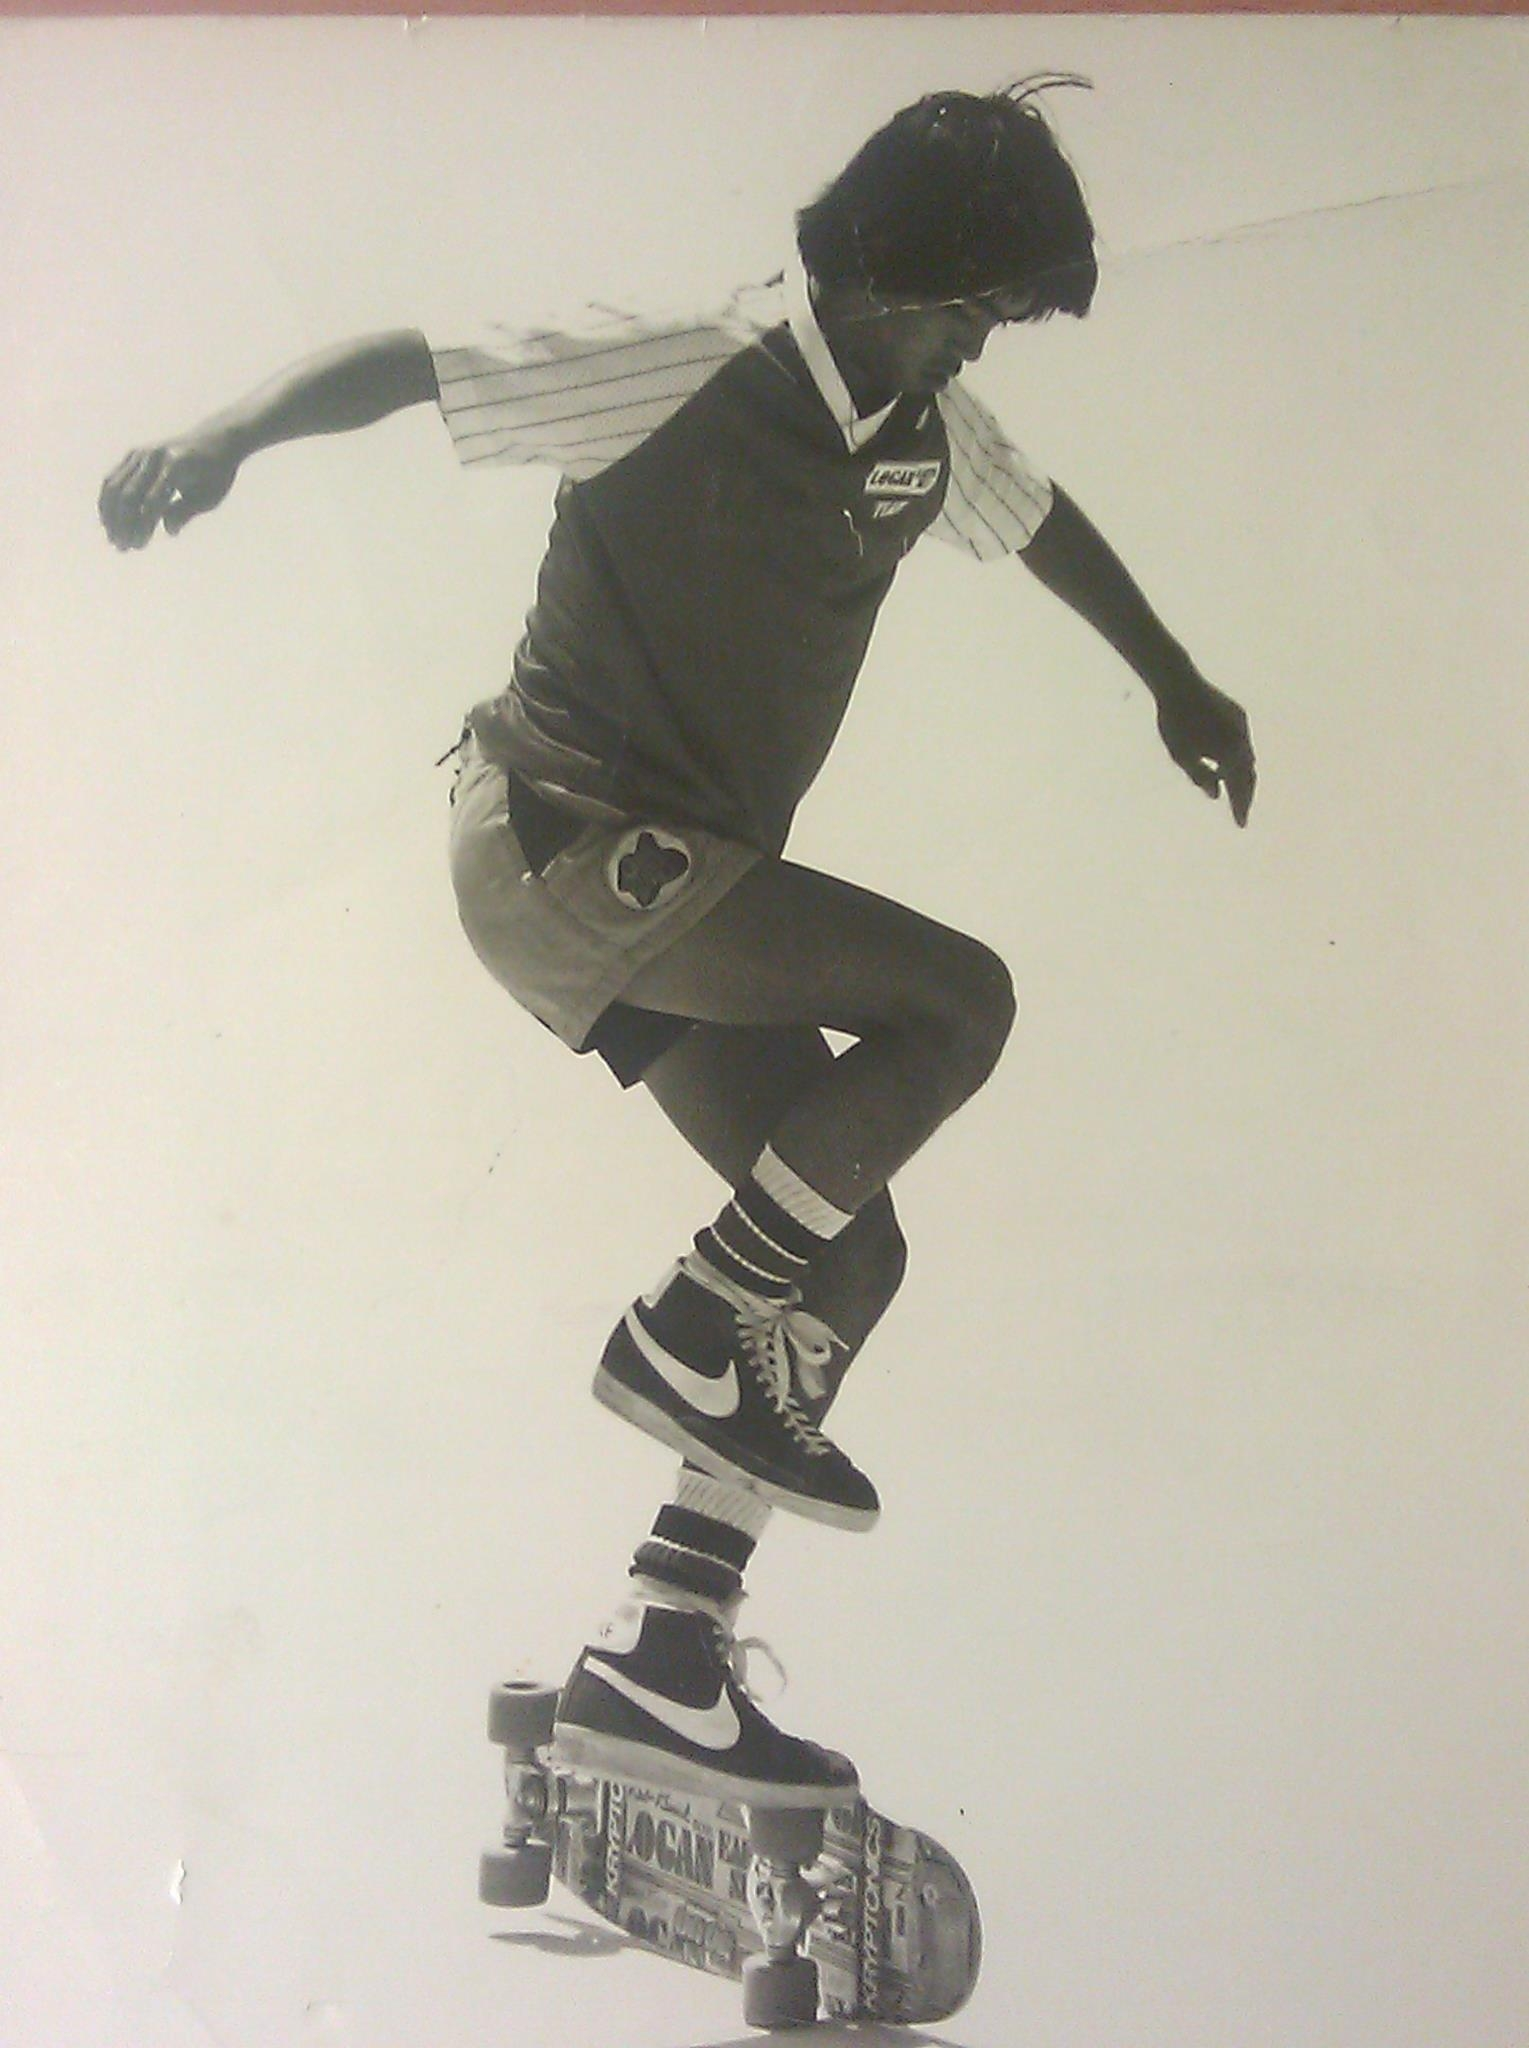 Photo: Eddie using his freestyle skills